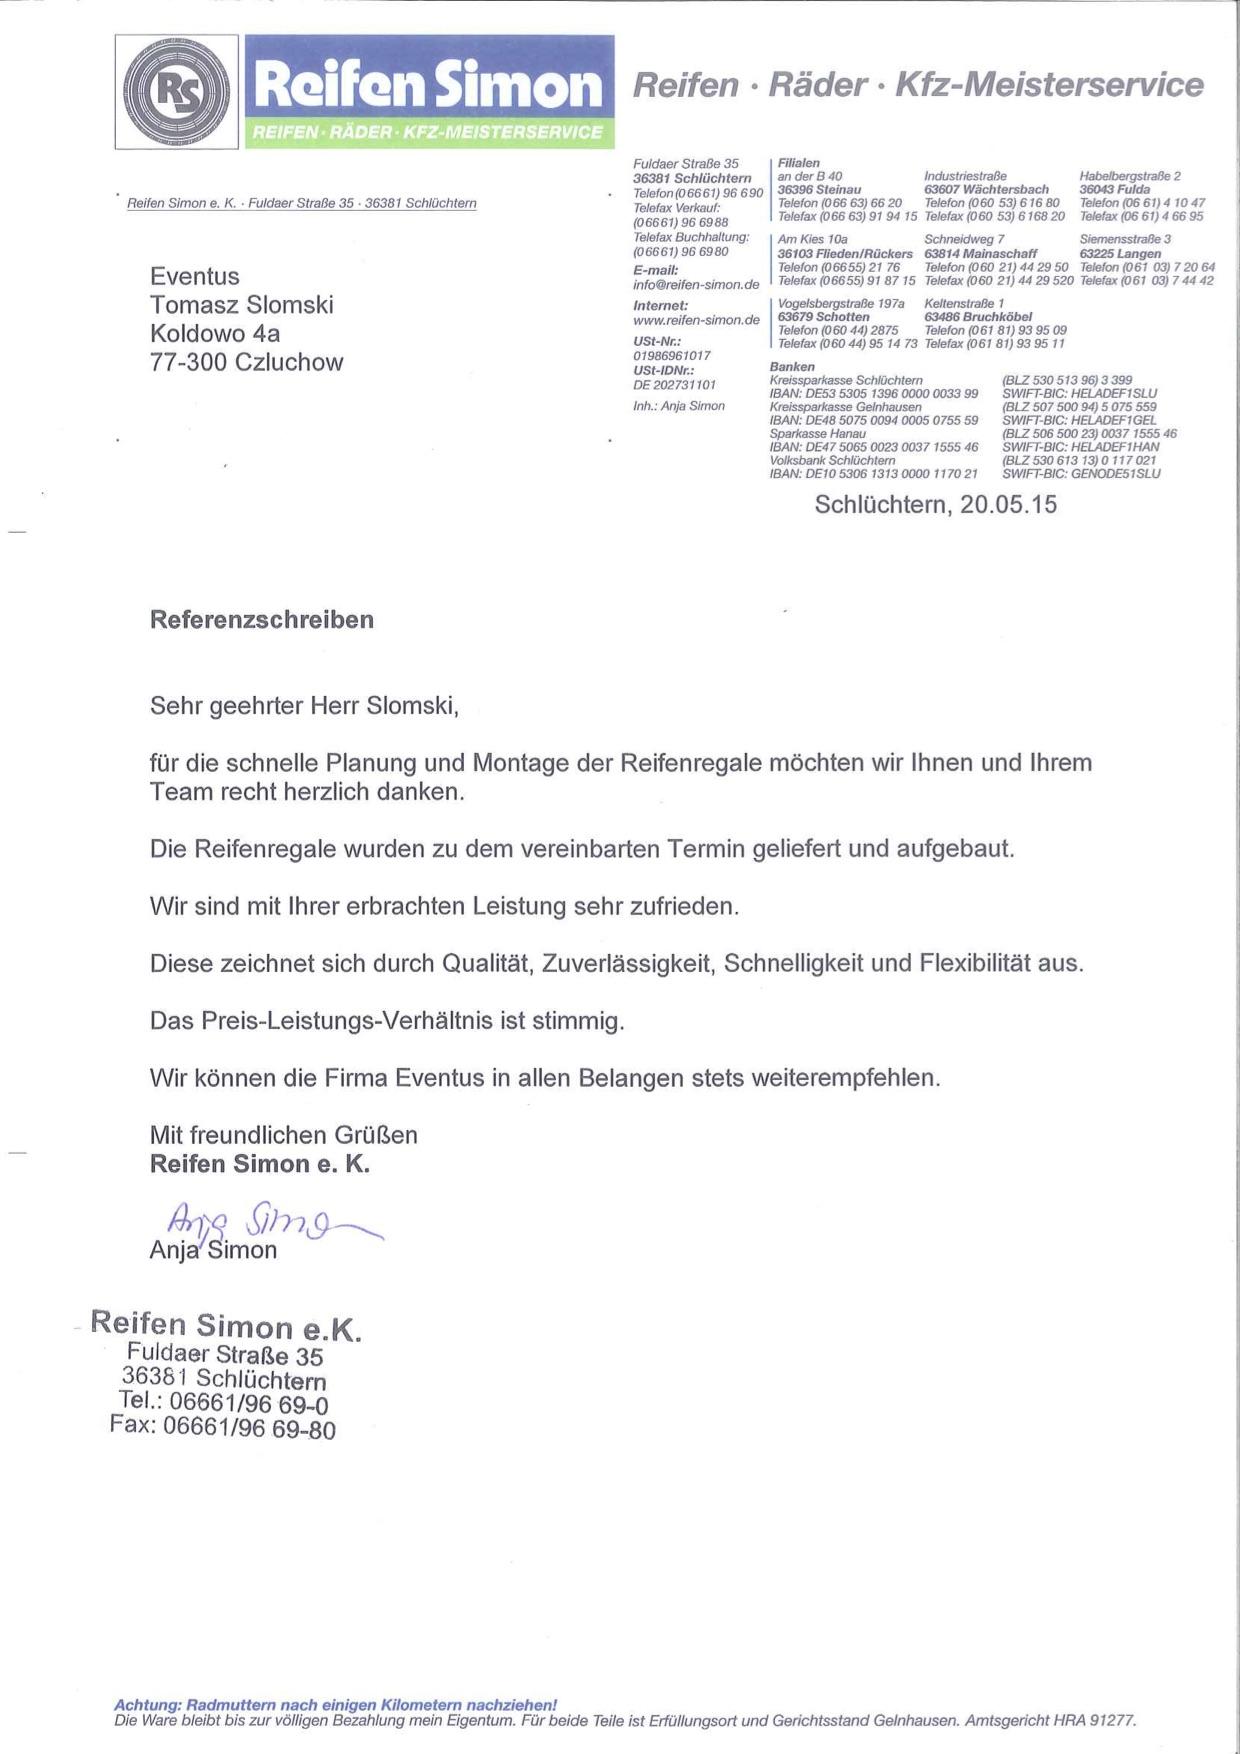 Reifen Simon Wächtersbach  EVENTUS Reifenregale